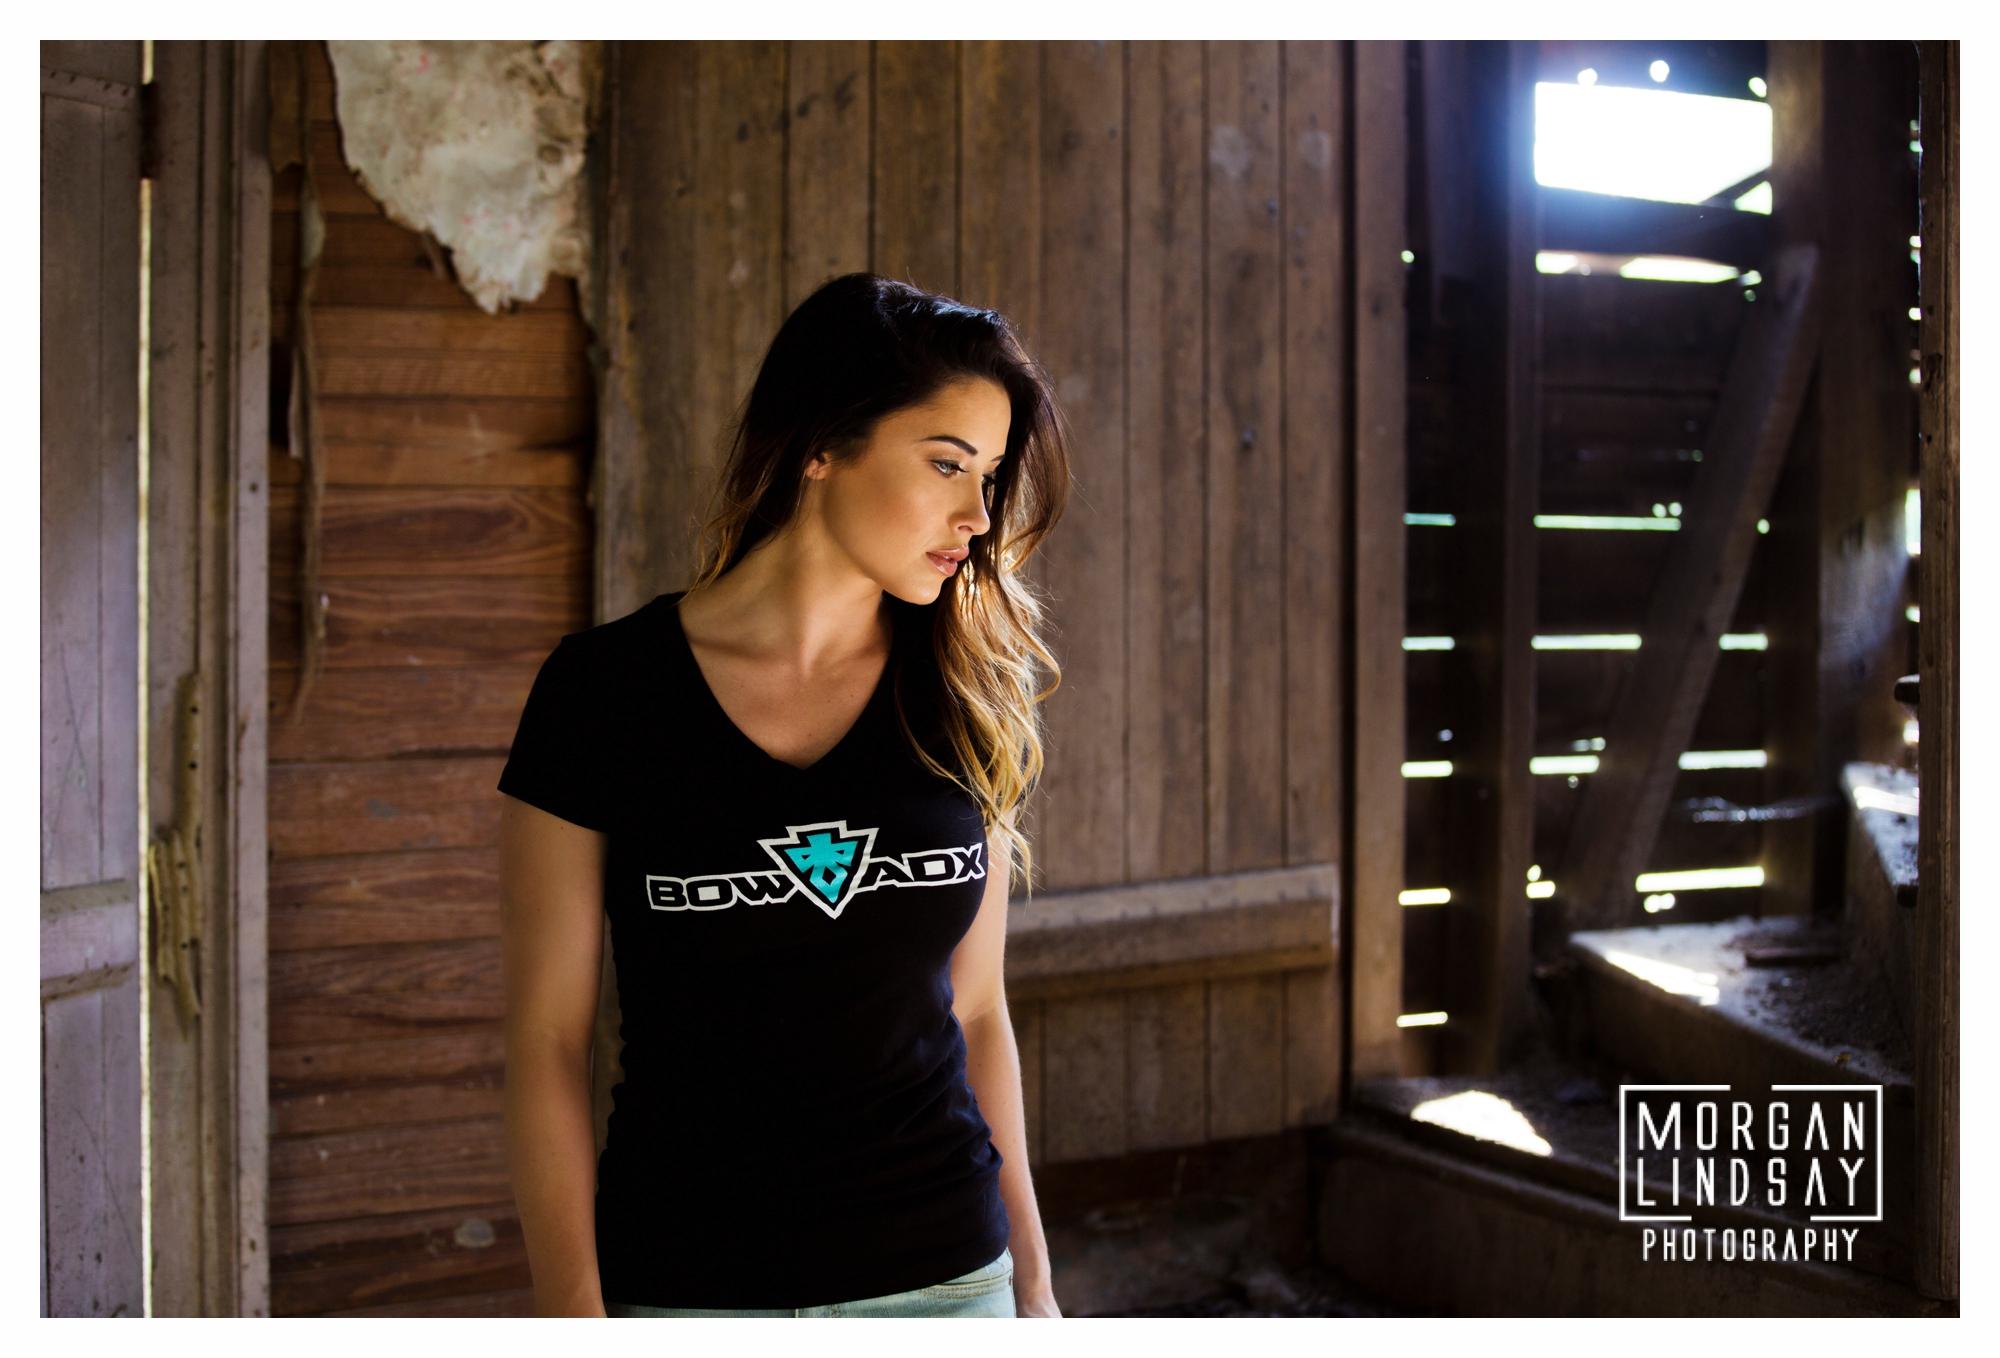 Nashville apparel promo shoot